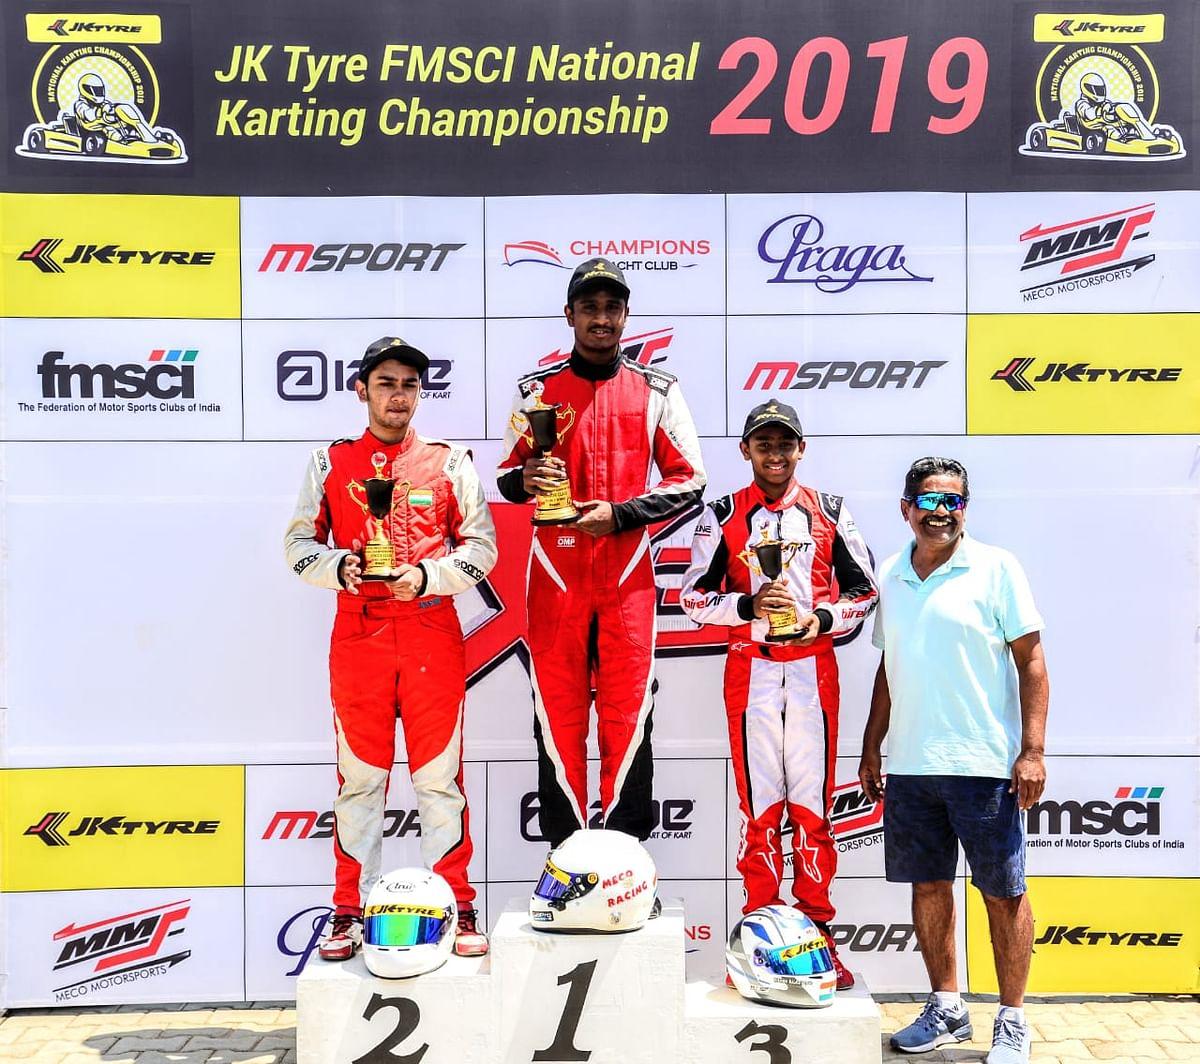 JK Tyre FMSCI National Karting Championship Round-1